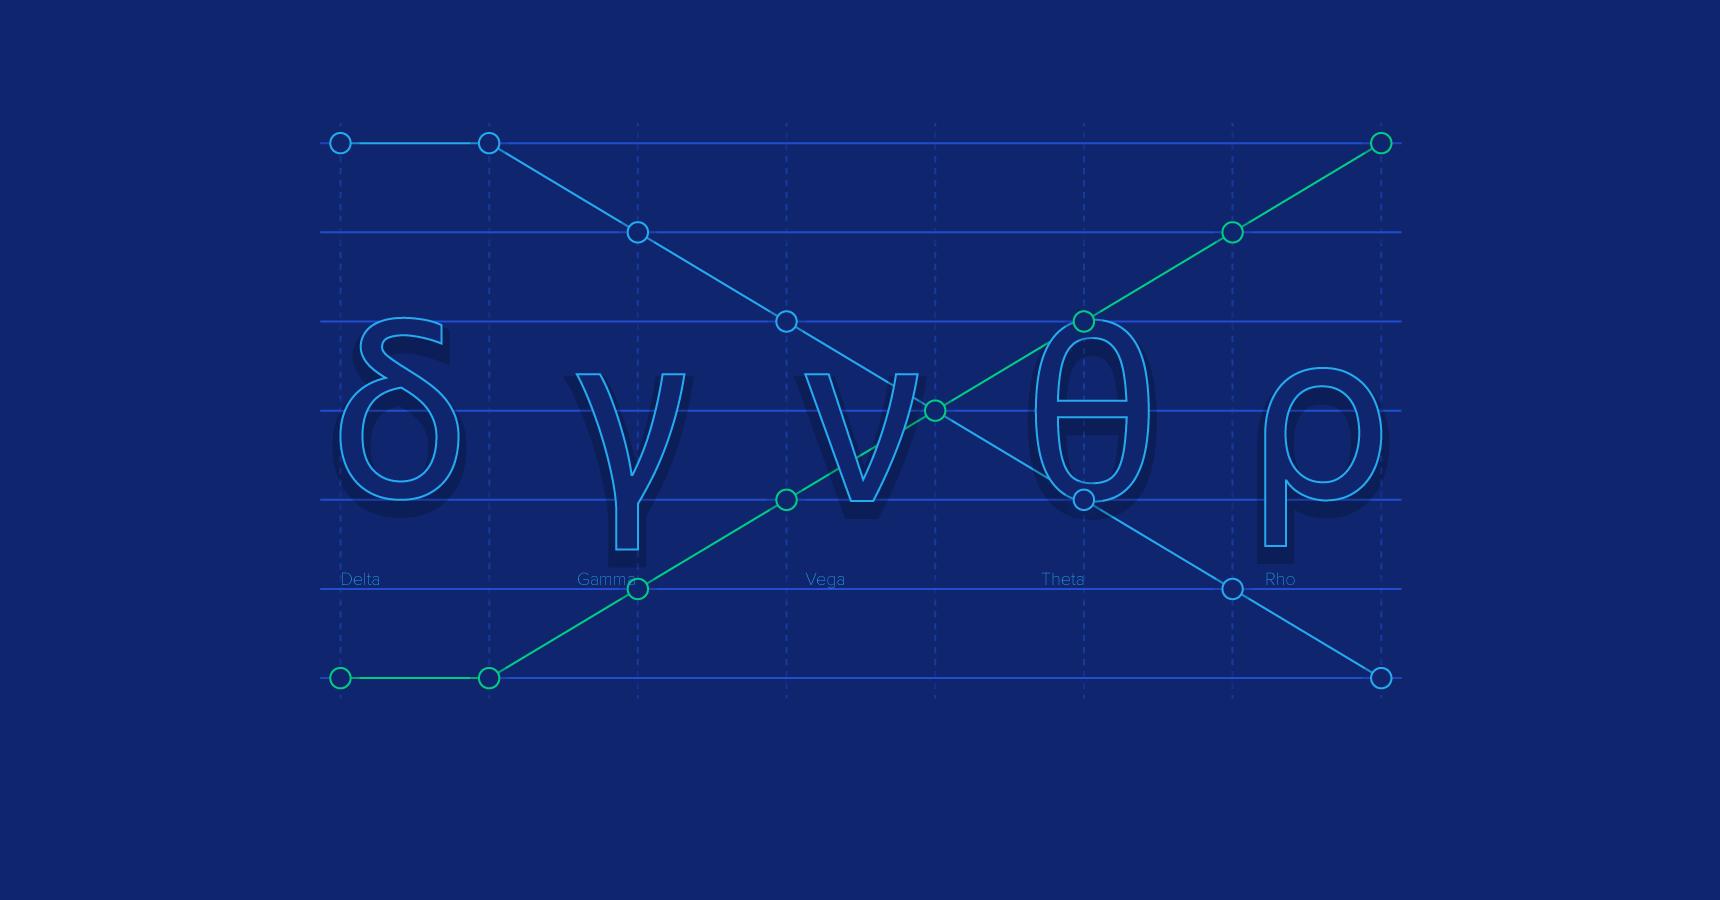 Excel构建不同到期时间和标的价格的期权价格矩阵